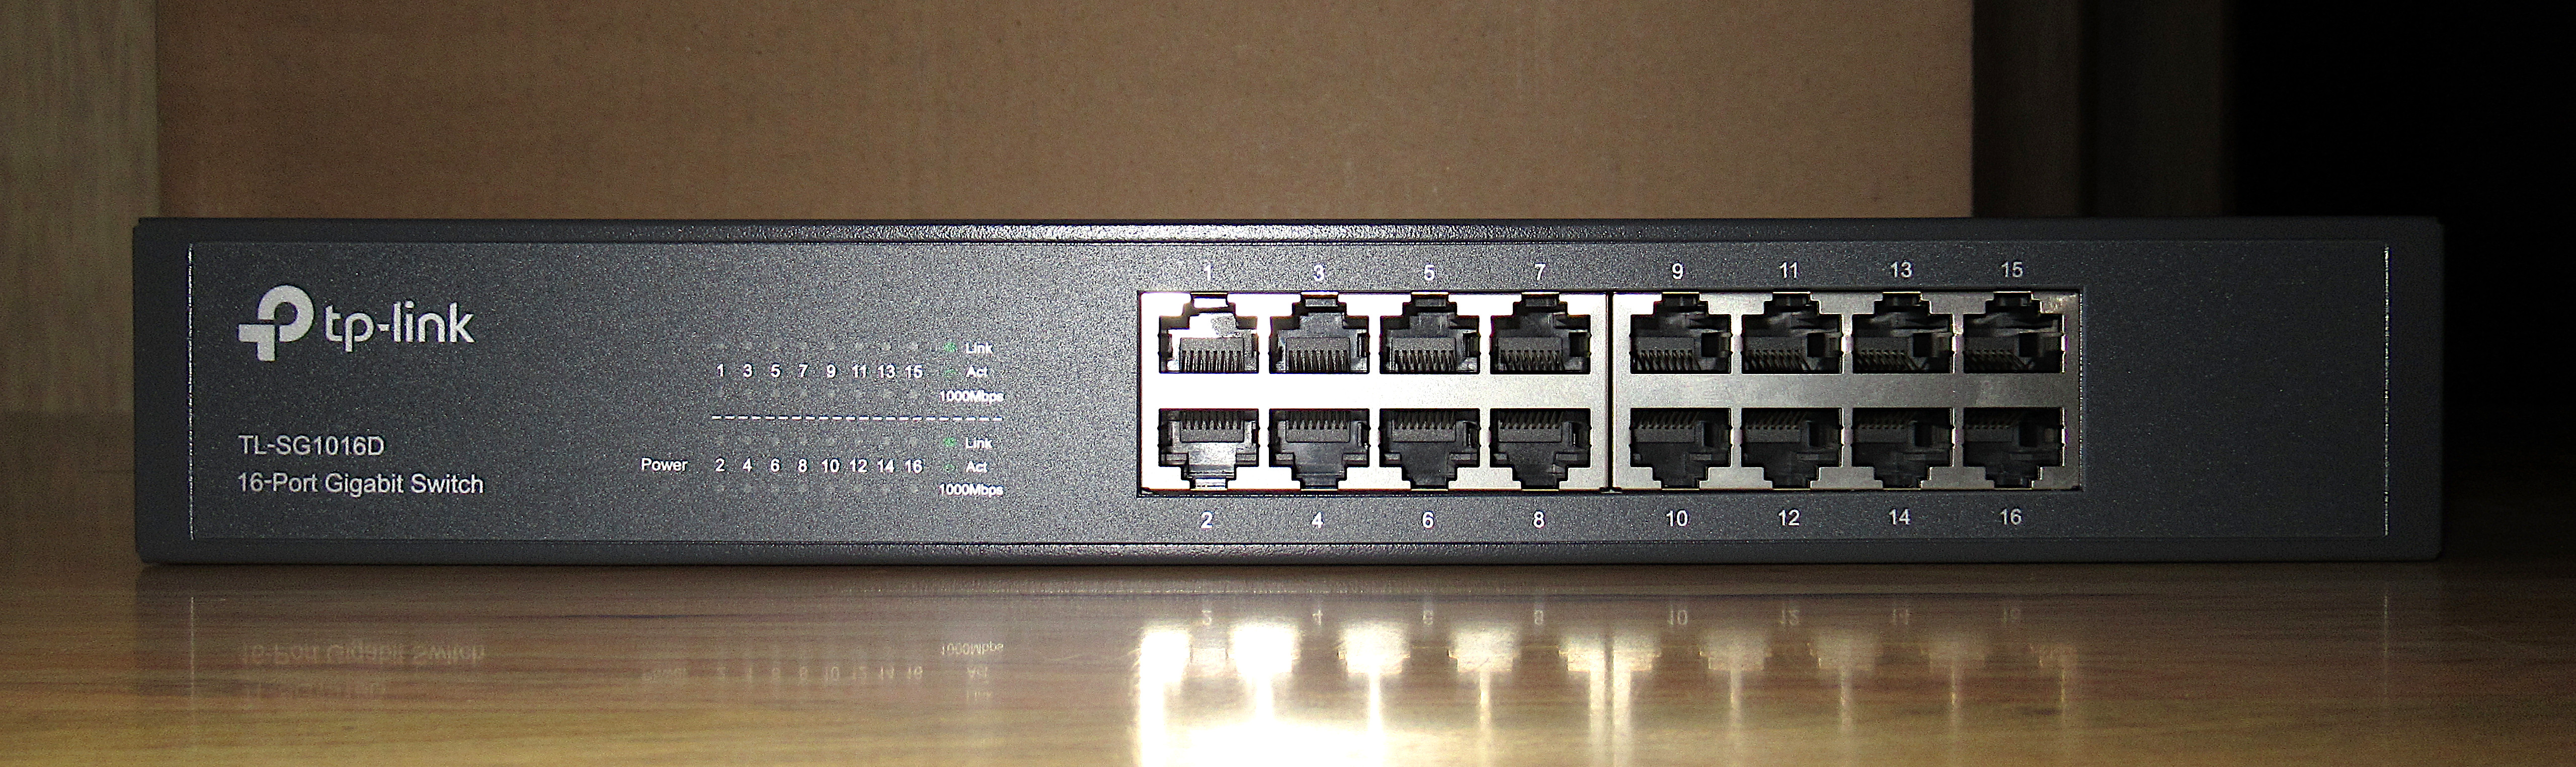 TP-Link TL-SG1016D 16-Port Network Switch